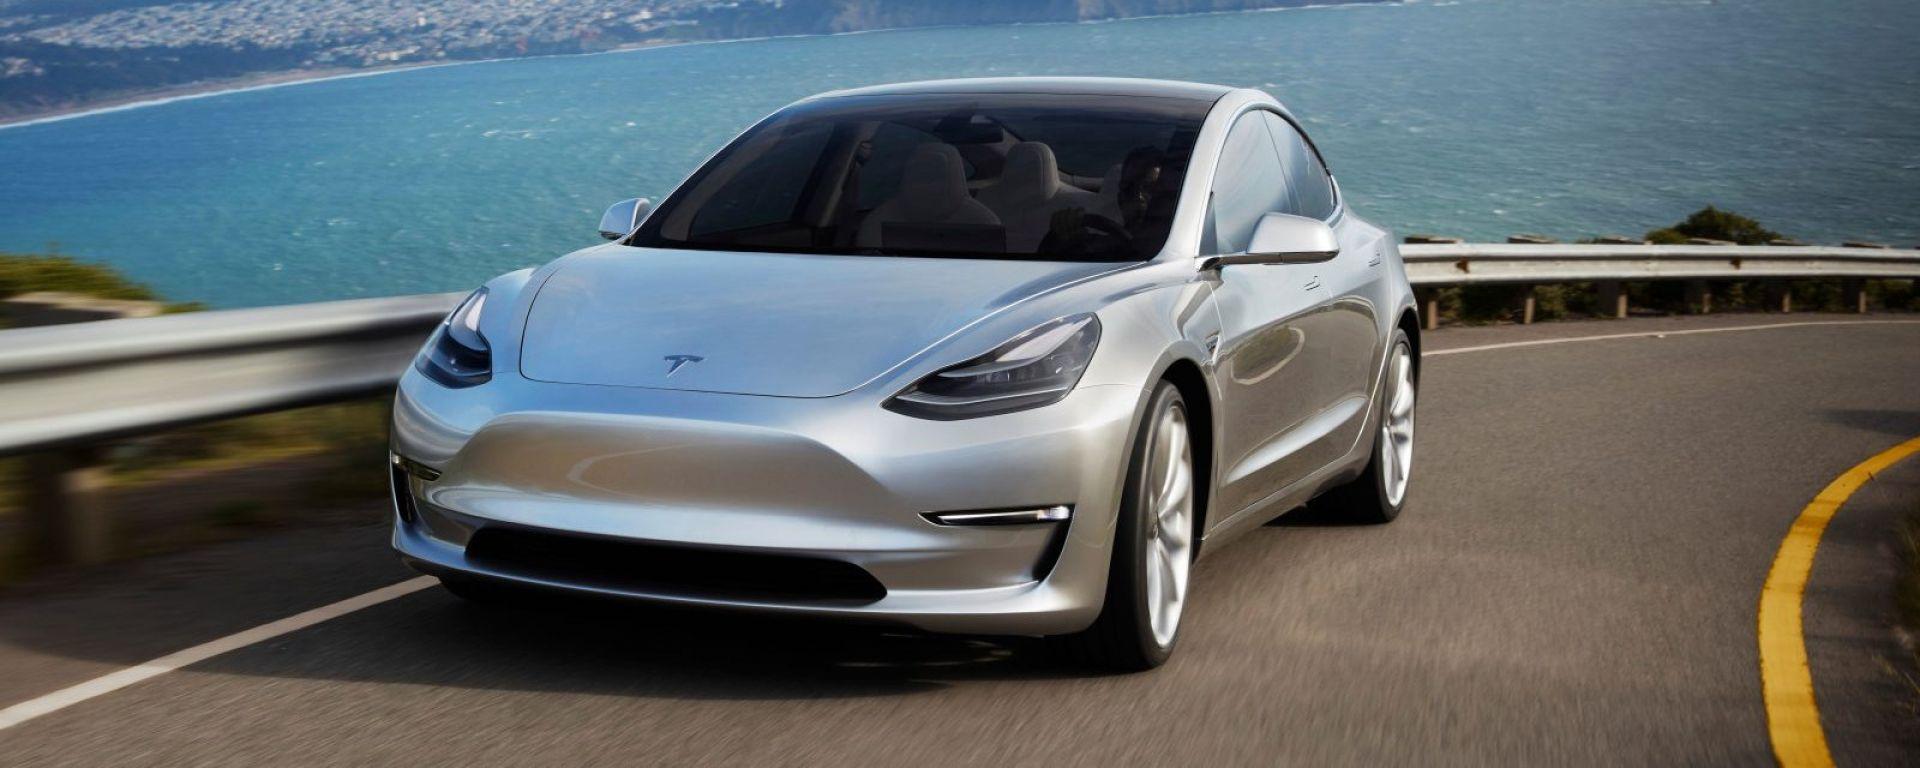 Tesla Model 3: la berlina elettrica della Casa americana